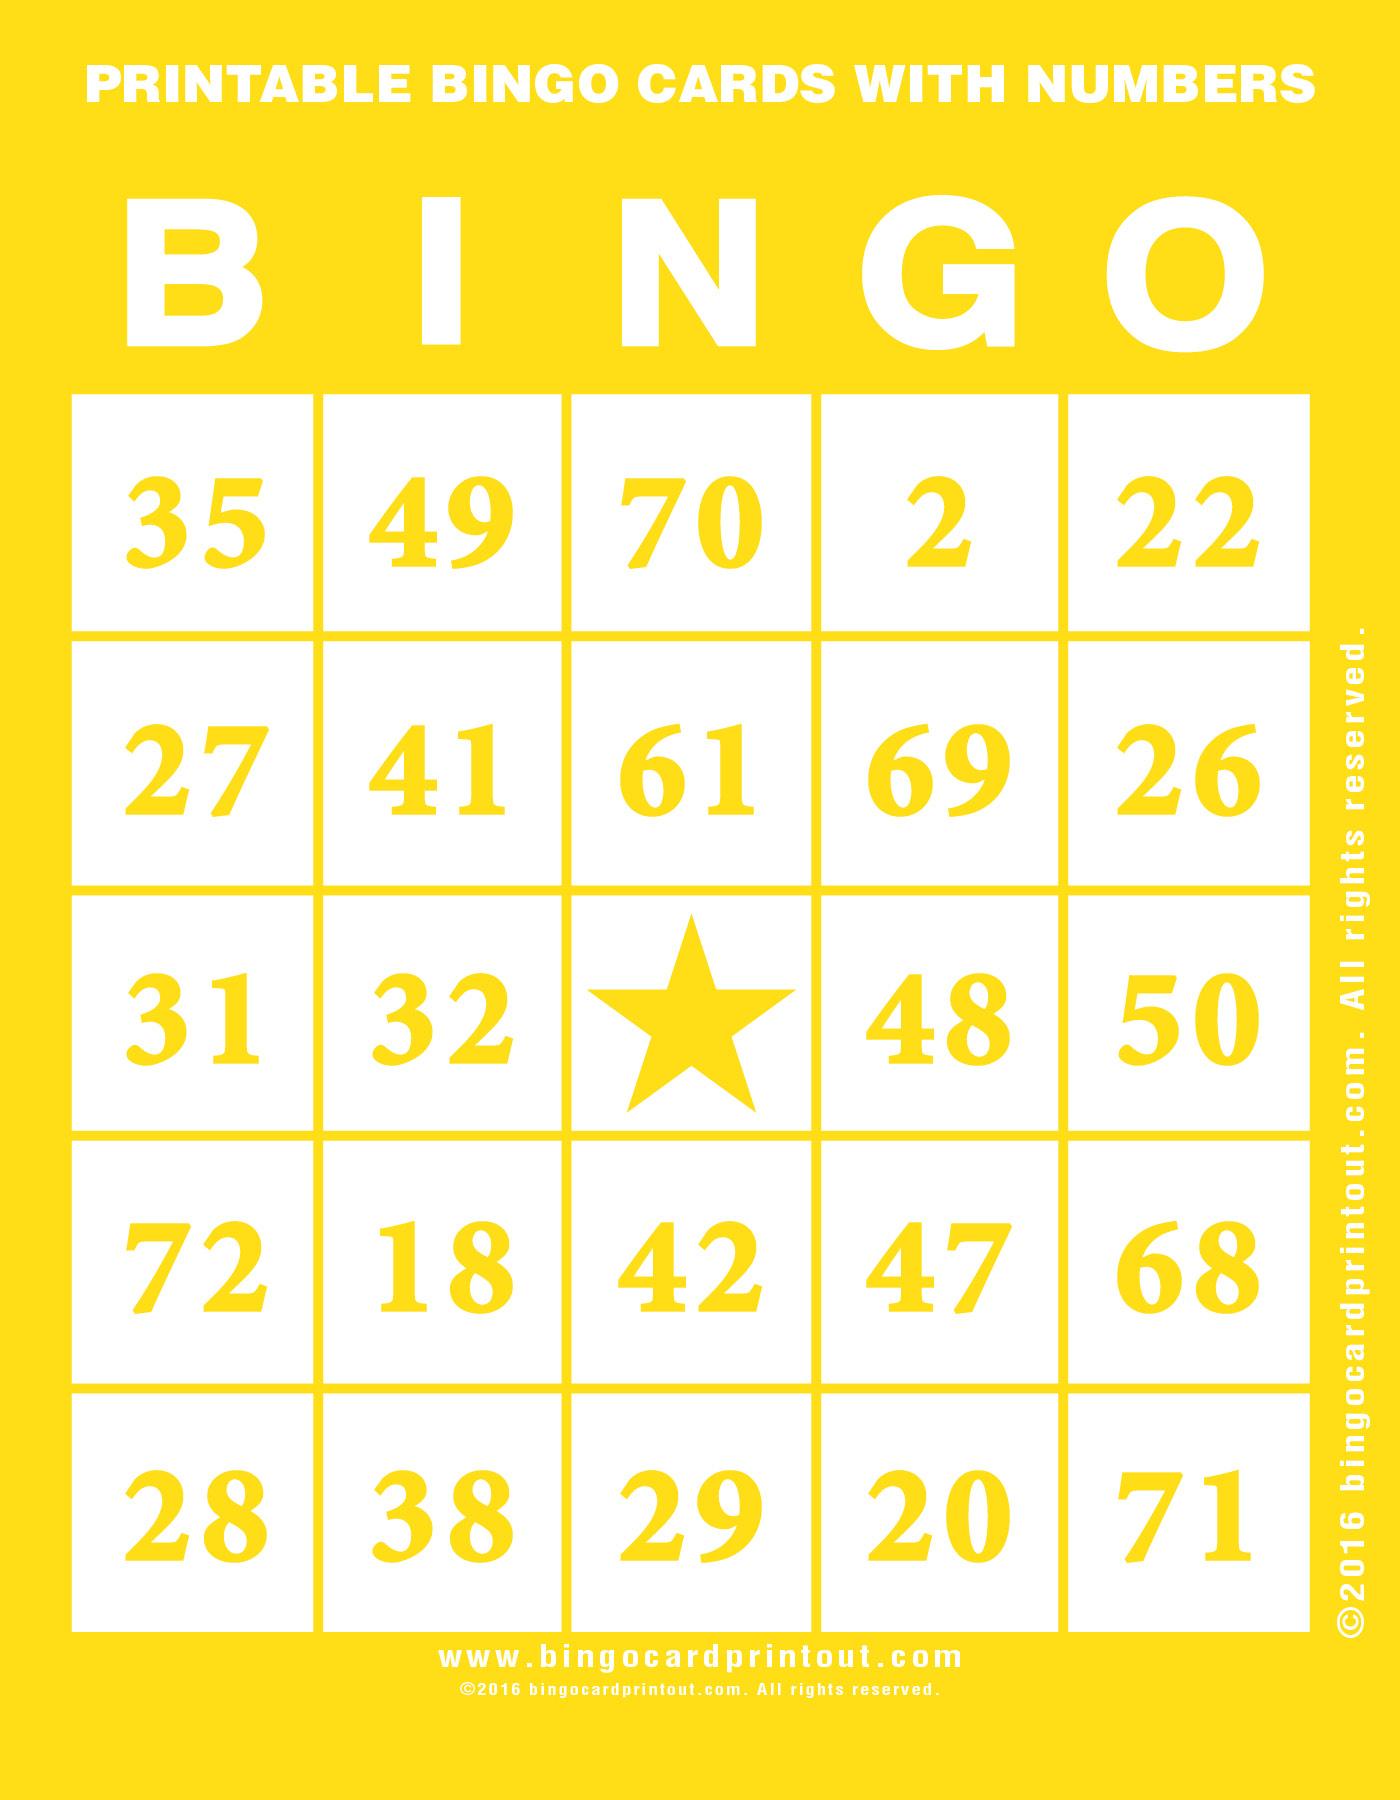 photo regarding Printable Number Bingo Cards identified as Printable Bingo Playing cards With Quantities -